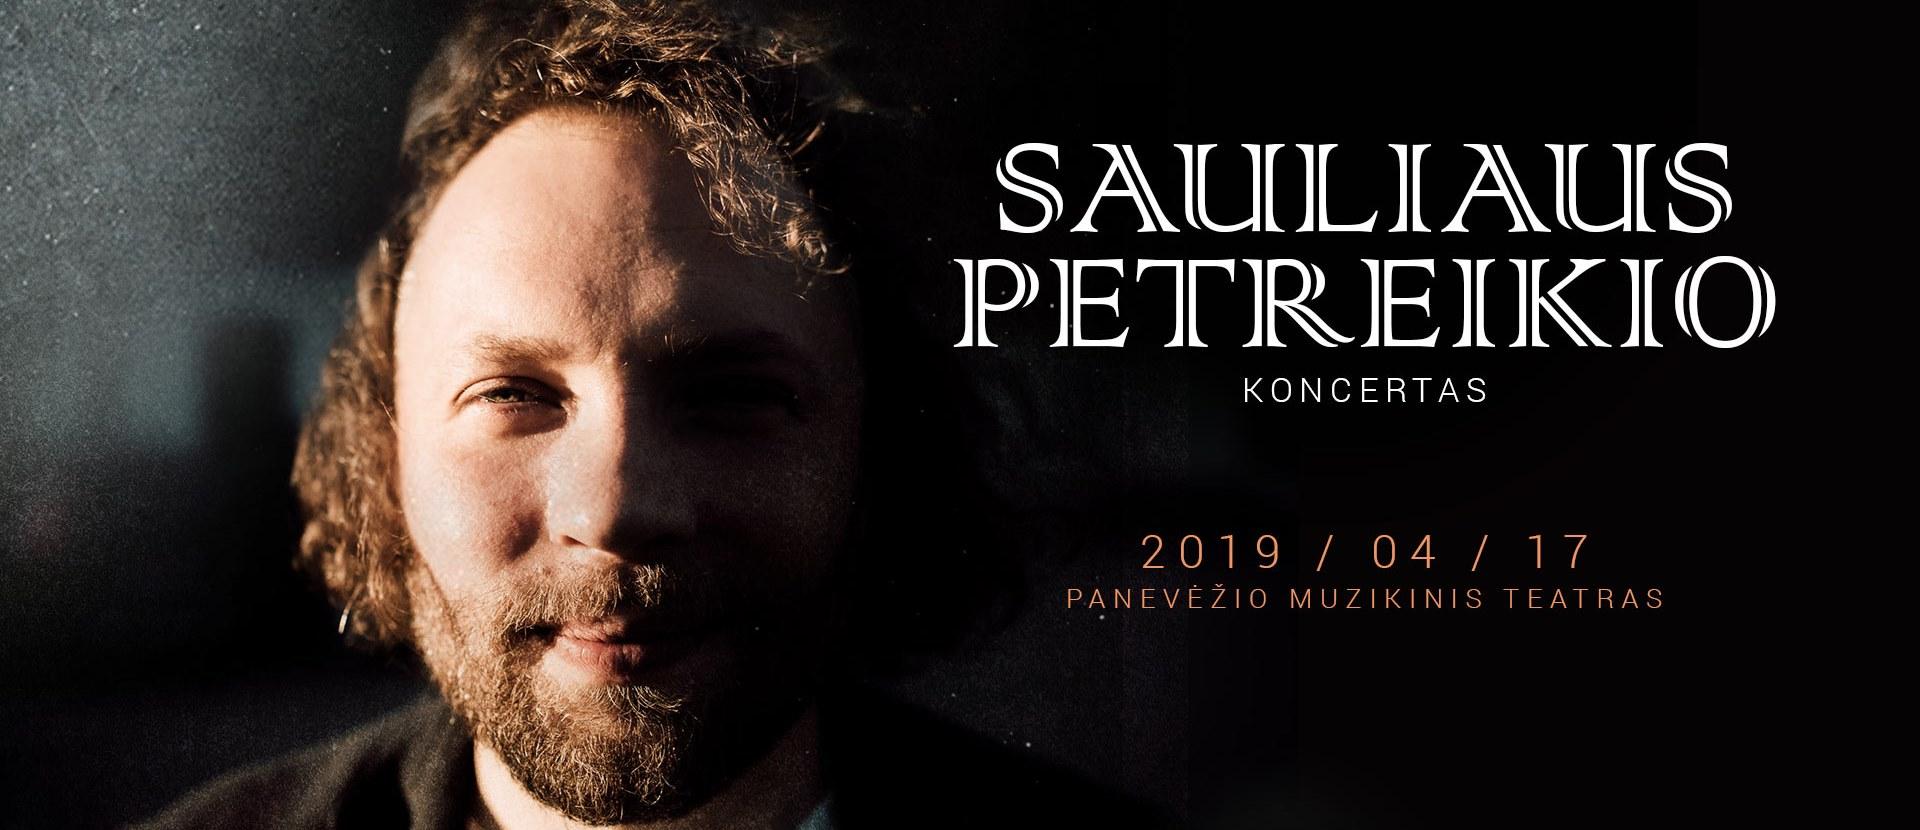 Saulius Petreikis band concert